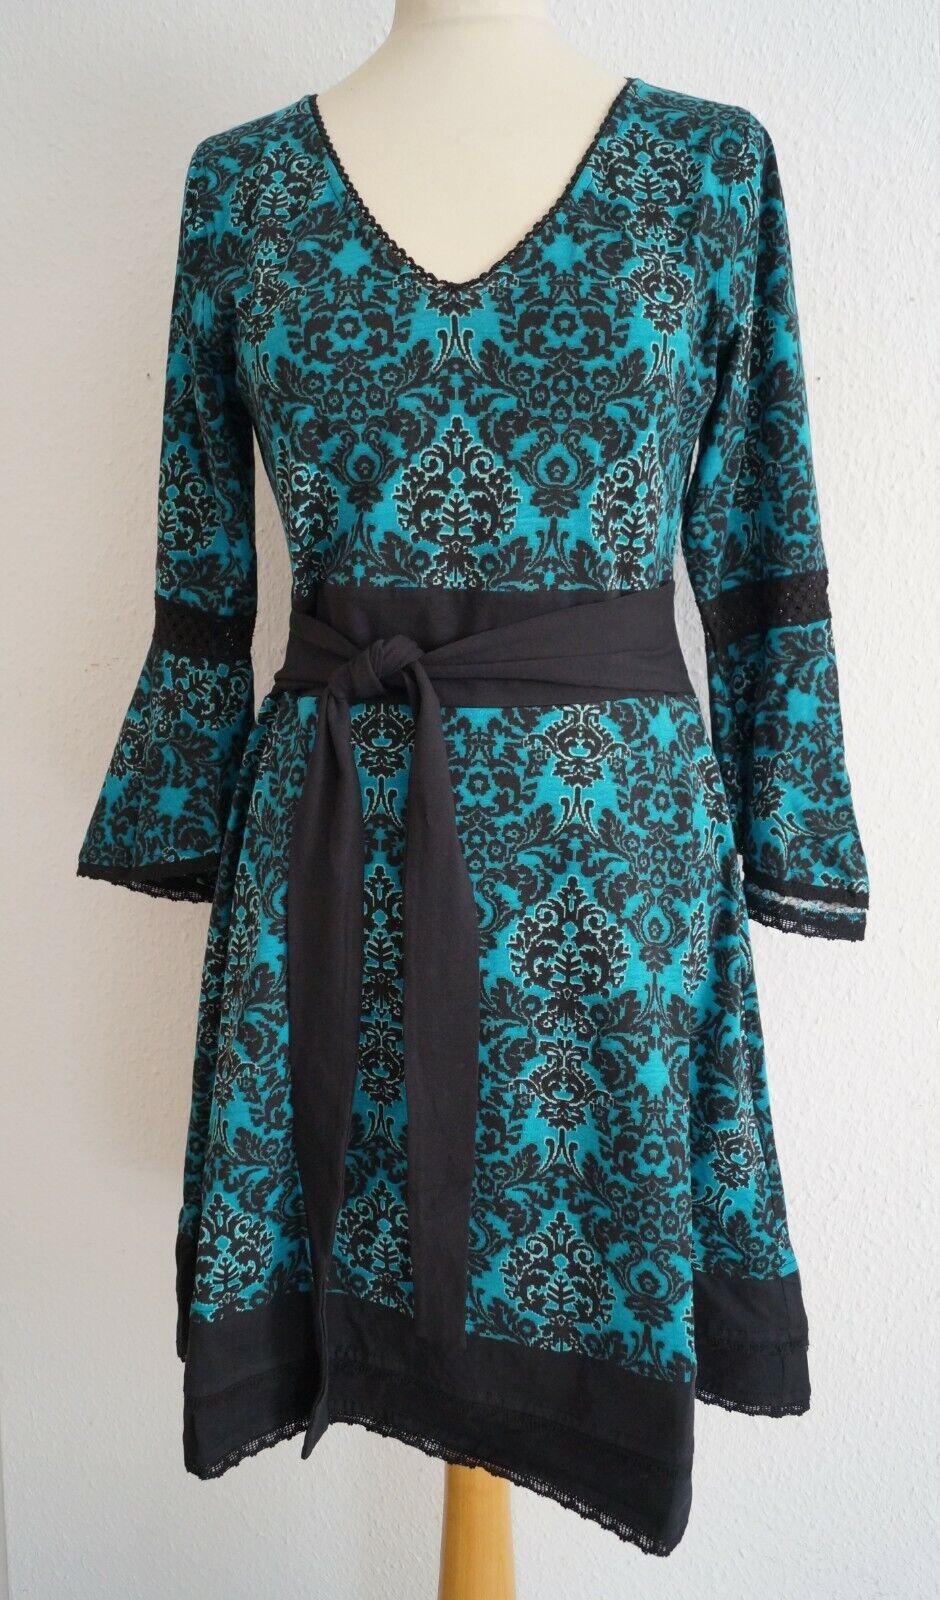 Chapati sigle Jersey Robe Fairtrade Bleu g-8115 S-XXL